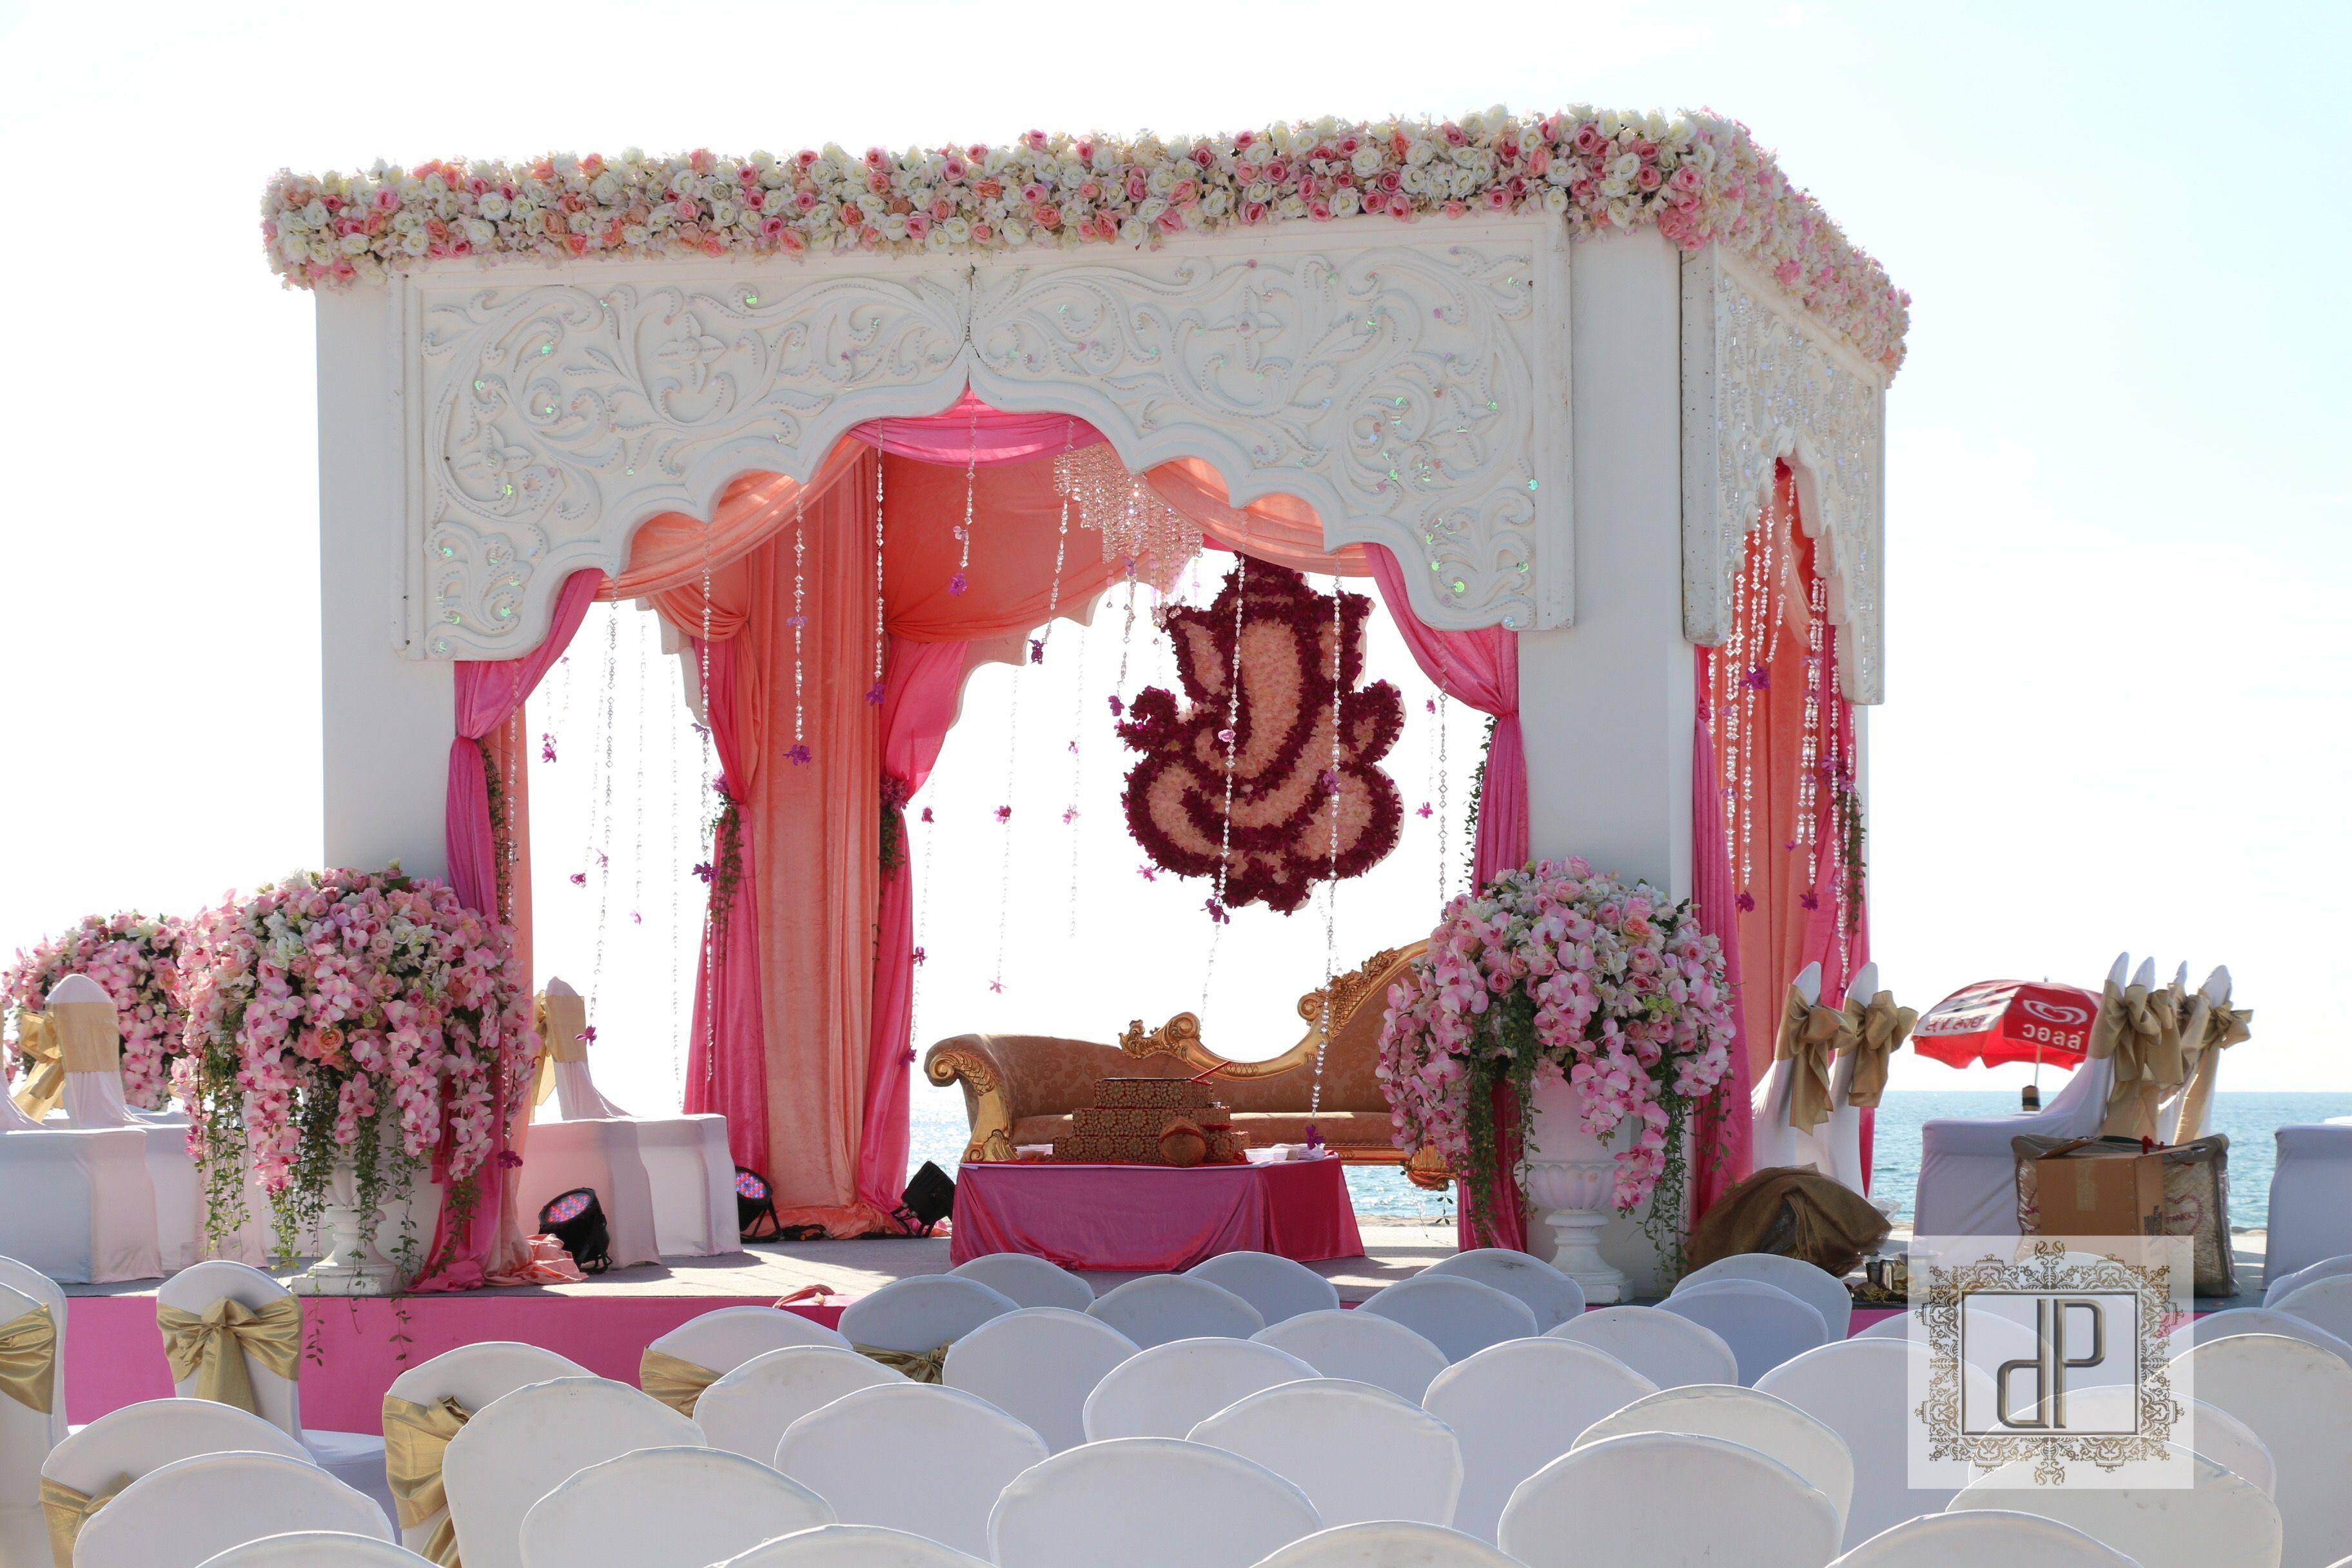 Wedding mandap decoration images  Sweet mandap wedding  Mandap decor  Pinterest  Weddings